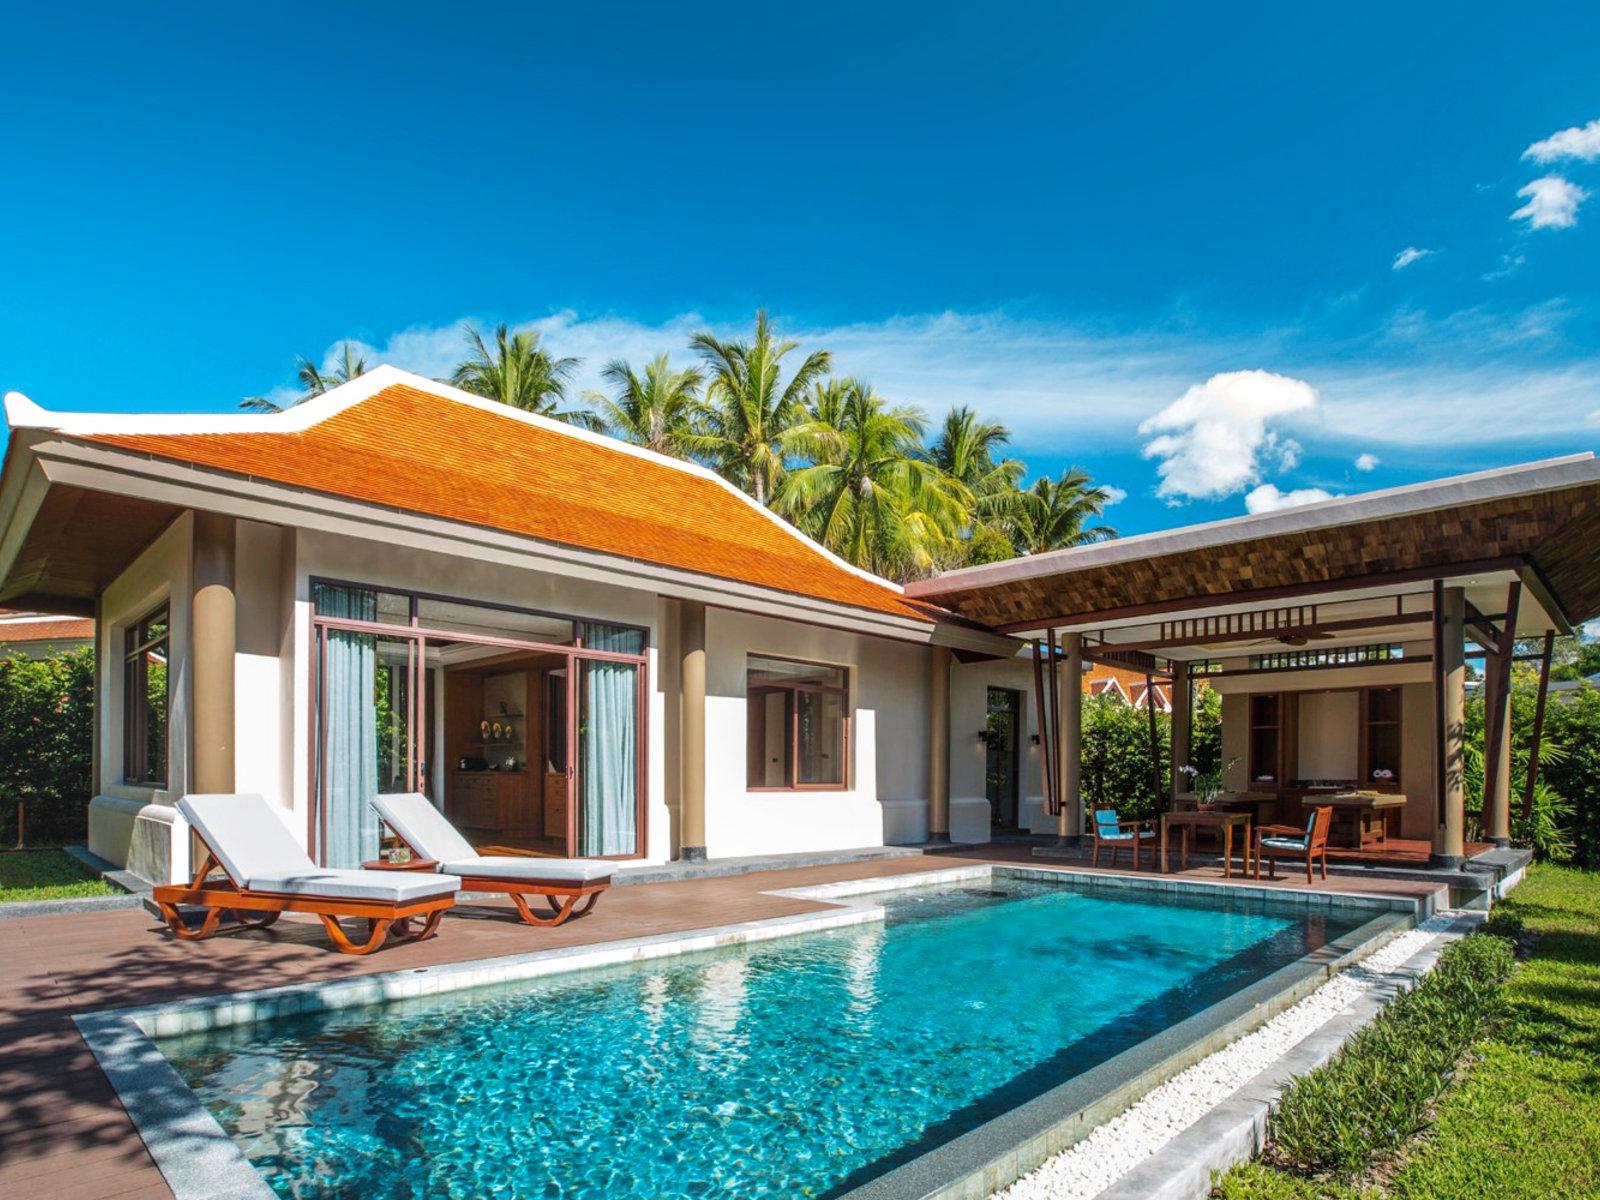 Wohnbeispiel Grand Deluxe Pool Villa